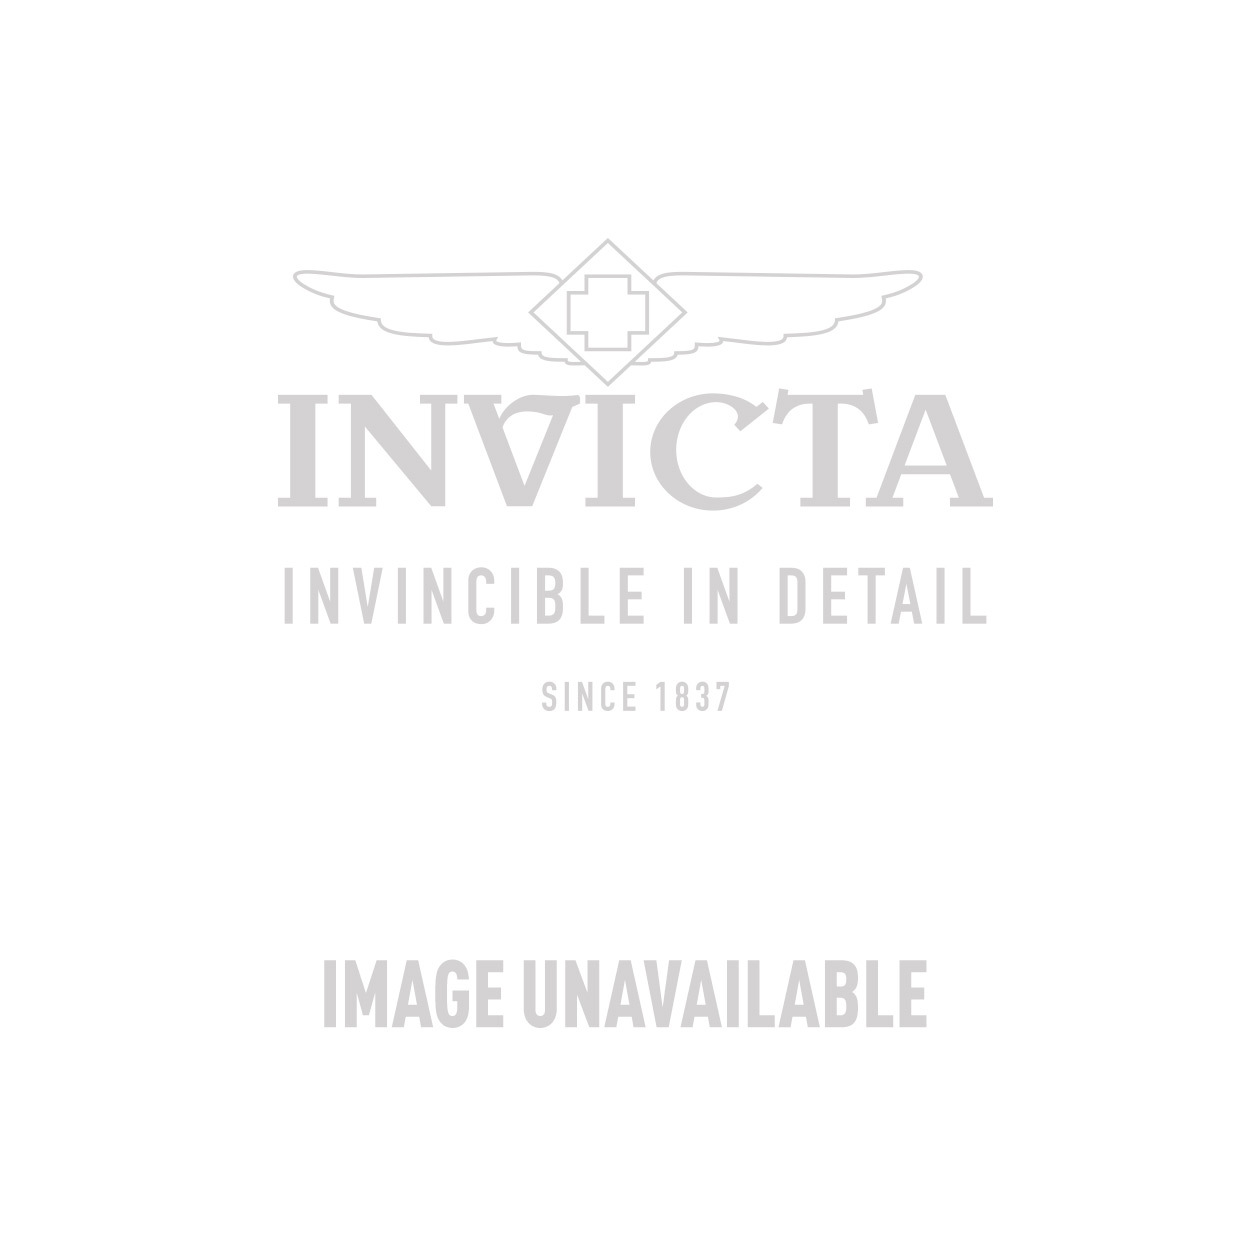 Invicta TI-22 Automatic Watch - Black case with Black tone Polyurethane band - Model 20523